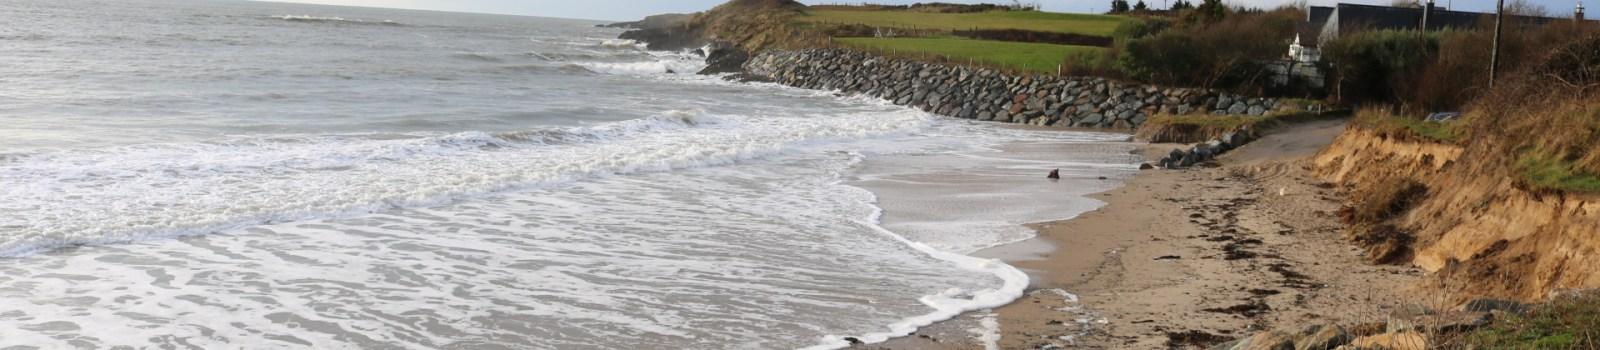 Kilpatrick Beach, Castletown